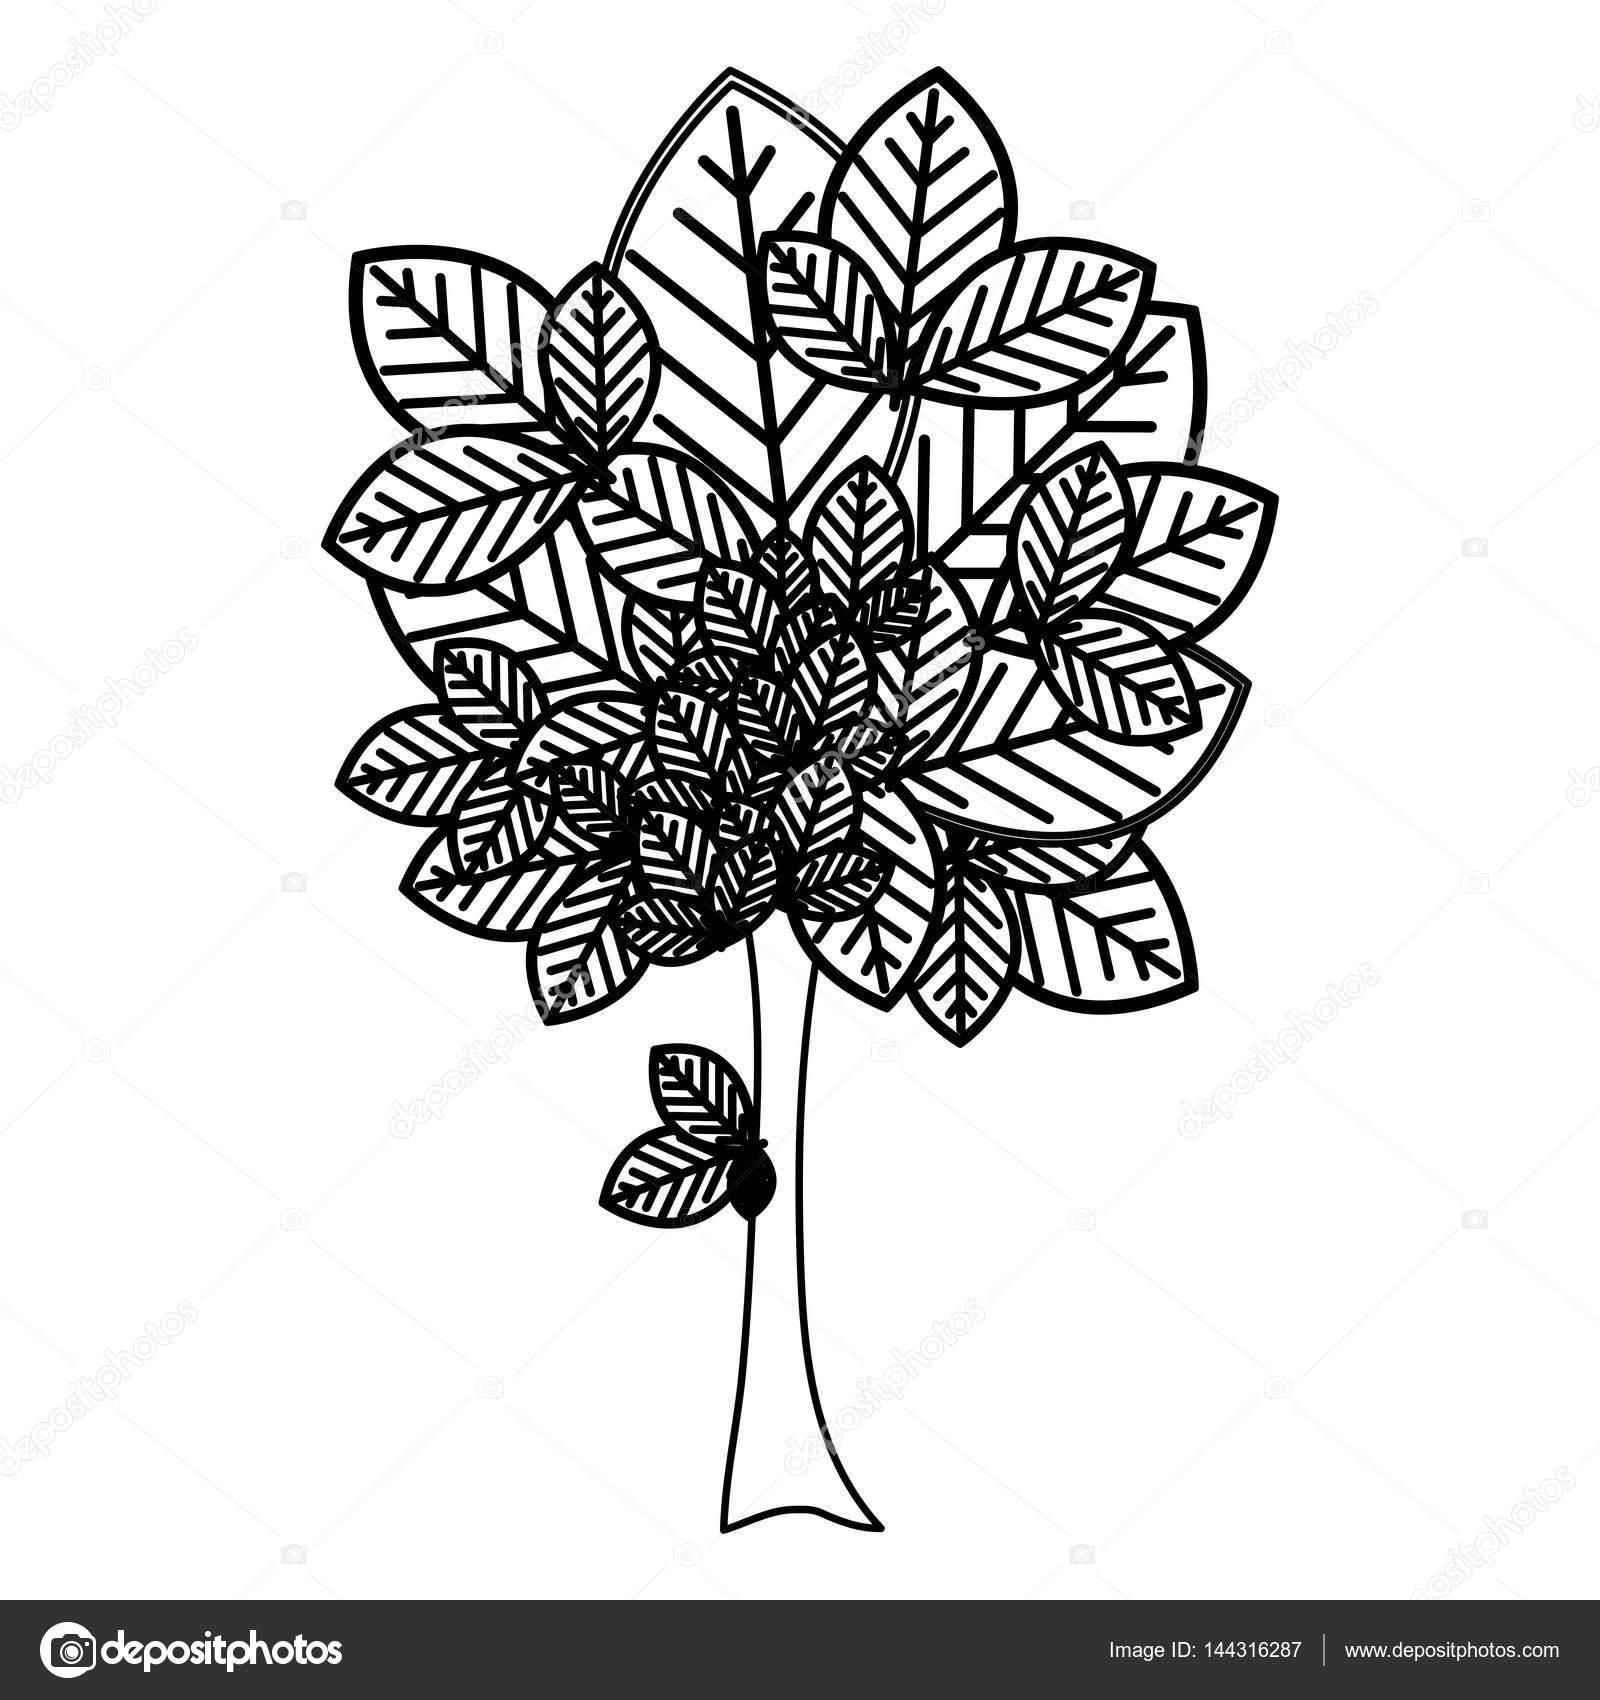 Dibujos Troncos De Arboles Para Pintar Silueta árbol